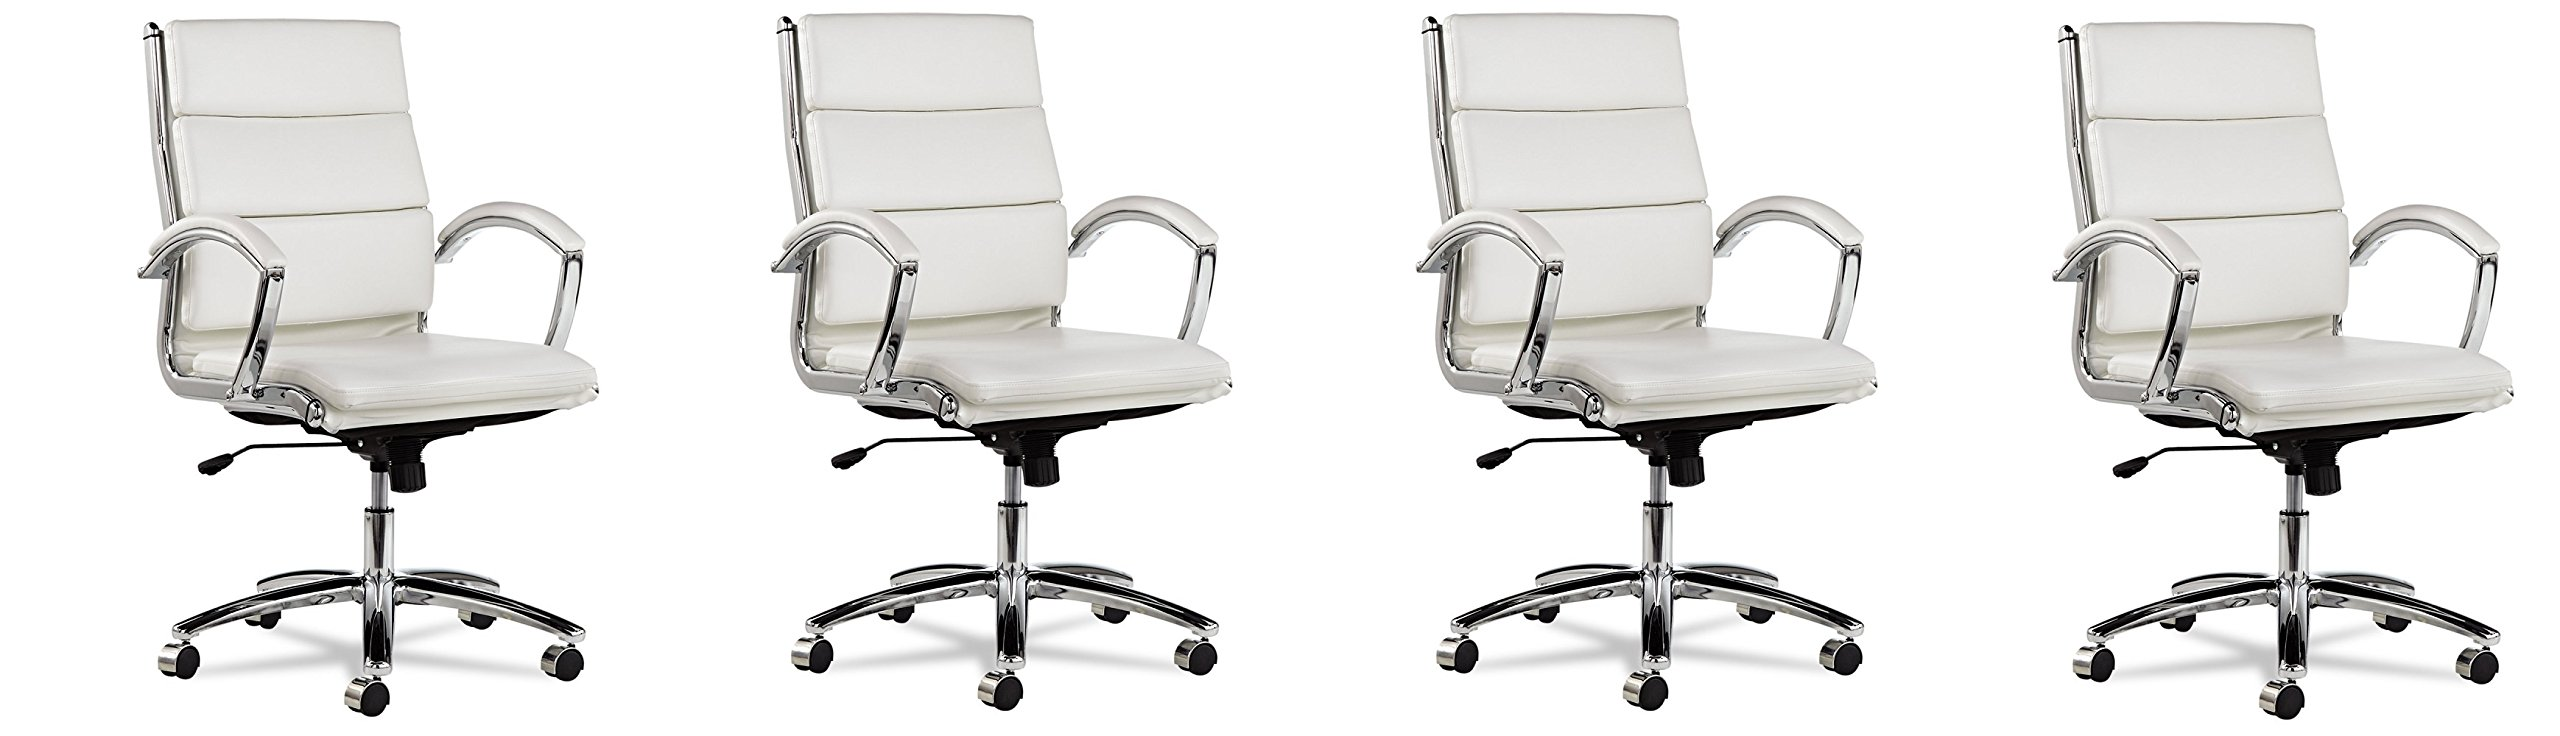 Alera Neratoli Mid-Back Swivel/Tilt YPGsML Chair, White Faux Leather, 4 Chairs